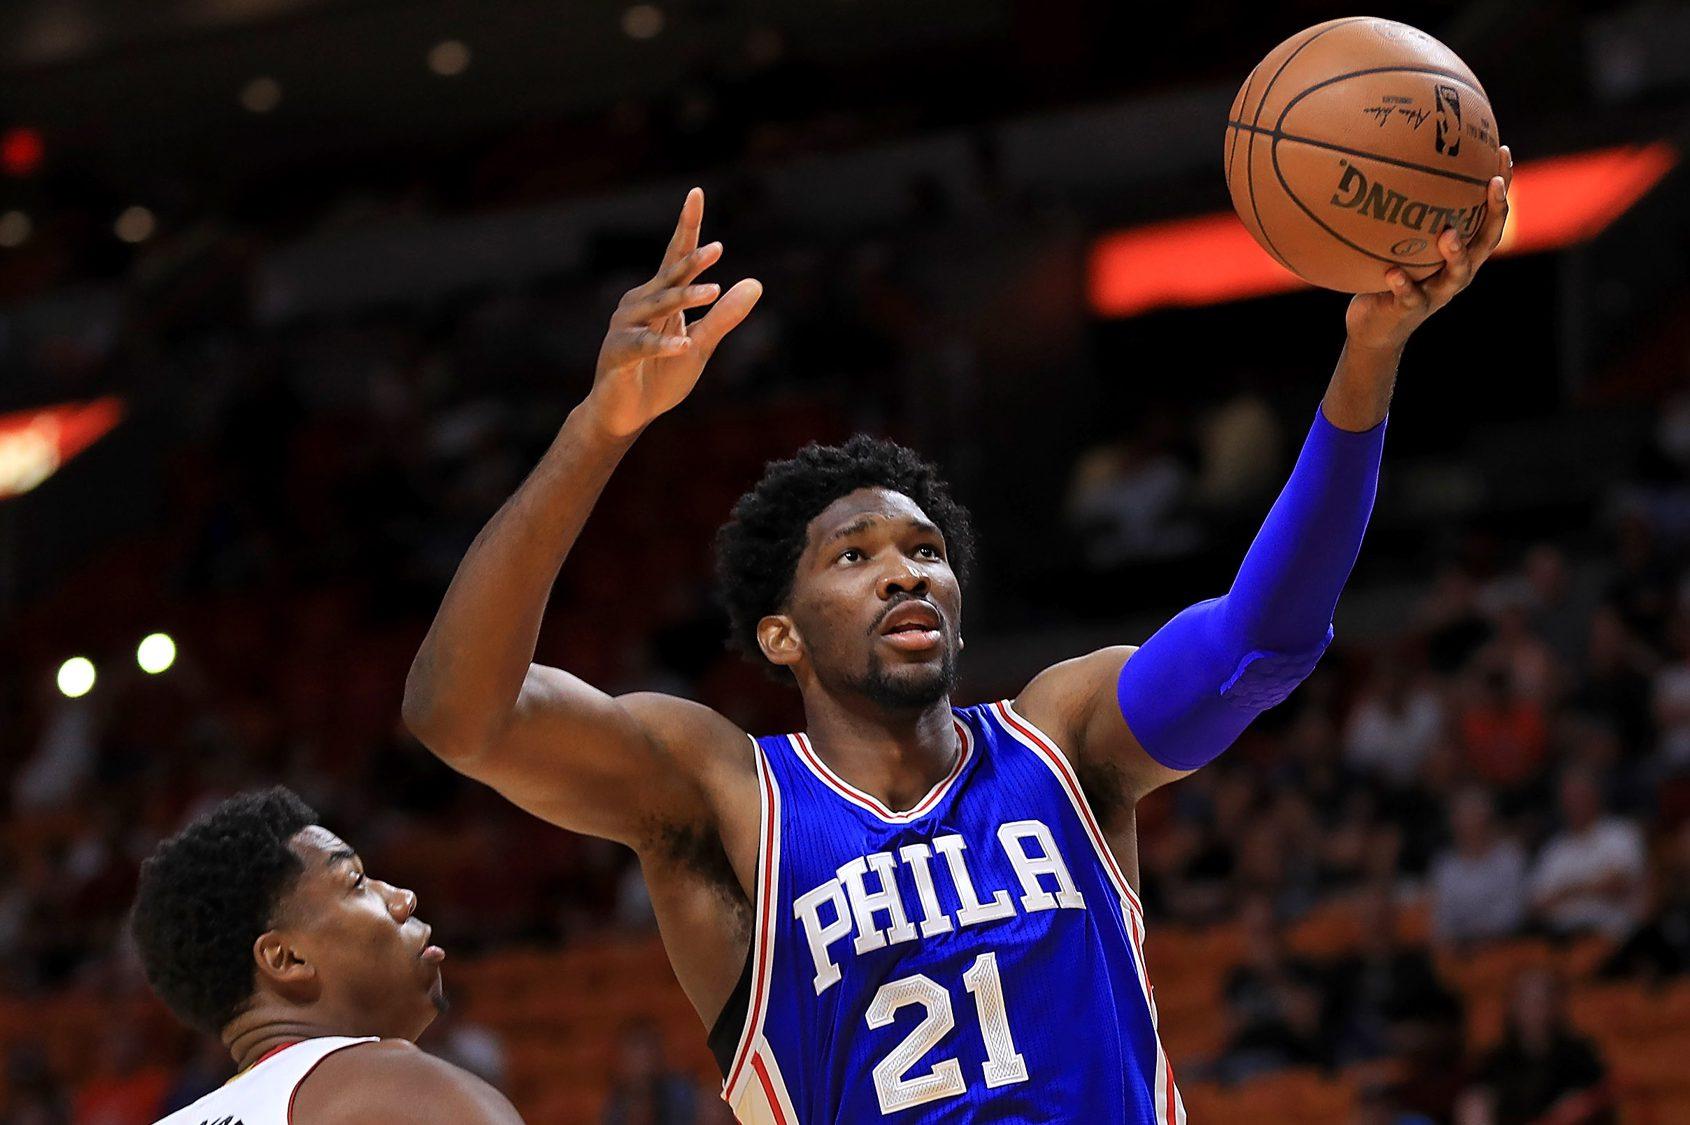 e58632ce5 Joel Embiid  21 of the Philadelphia 76ers drives on Hassan Whiteside  21 of  the